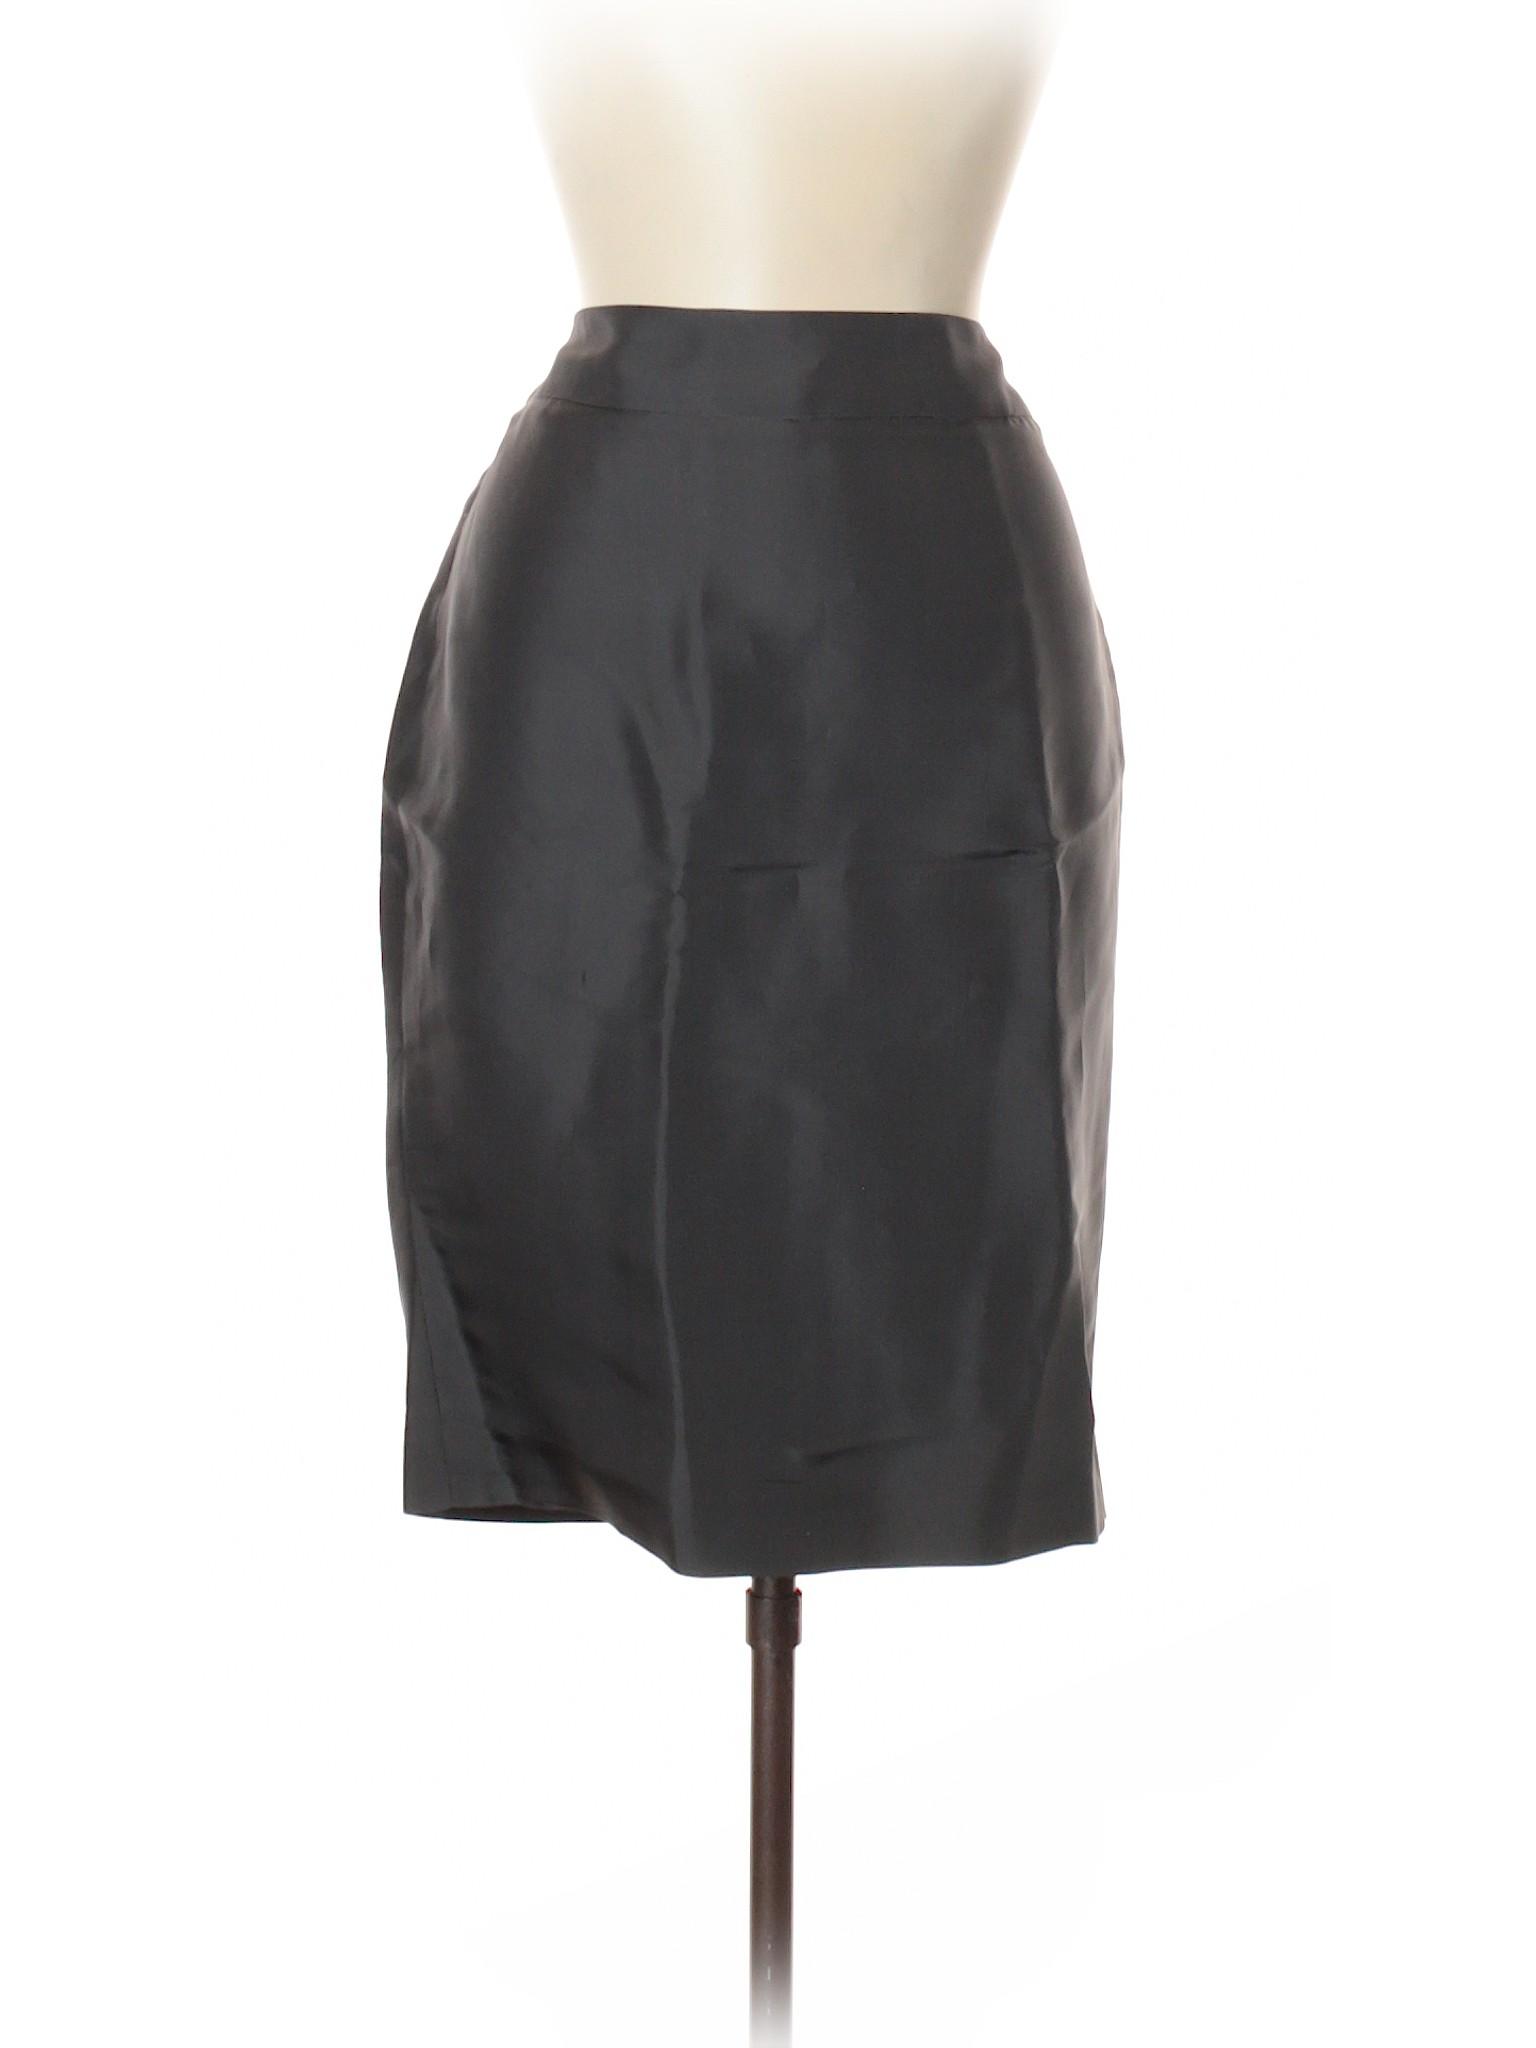 Casual Skirt Casual Boutique Skirt Boutique Skirt Casual Casual Boutique Boutique UwxqBaq48